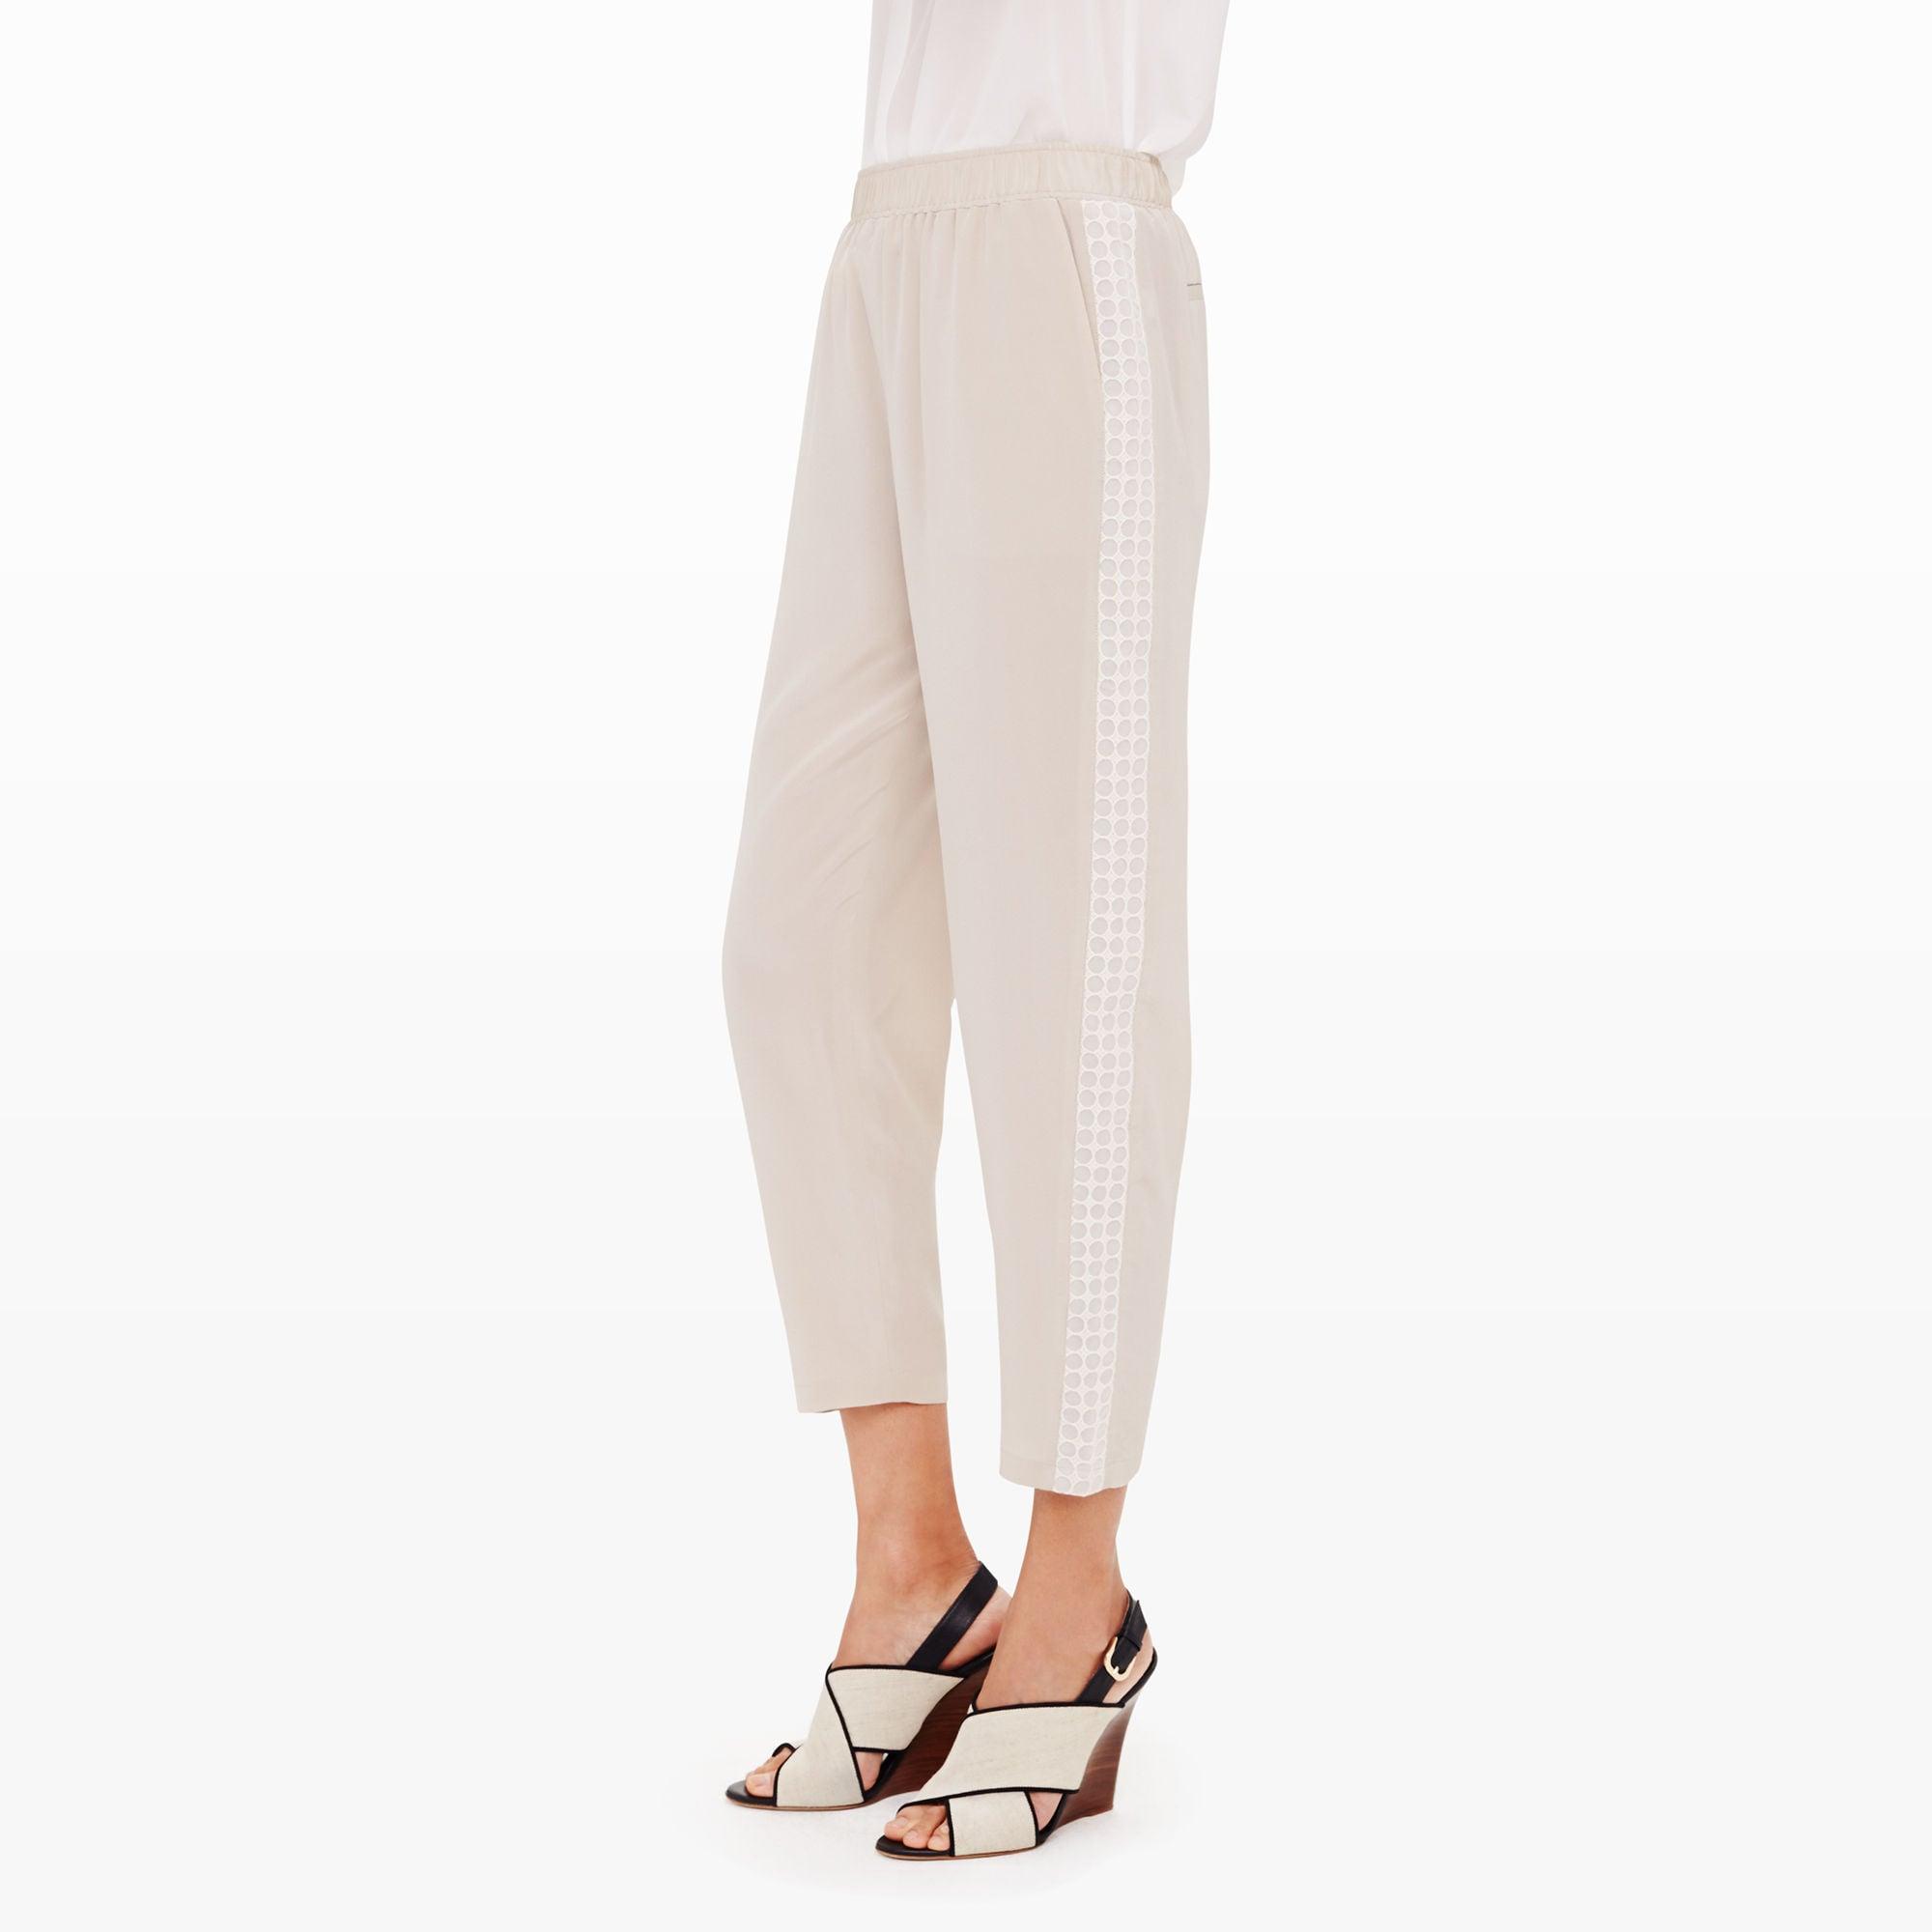 Club Monaco Maribella Silk Pant ($160)